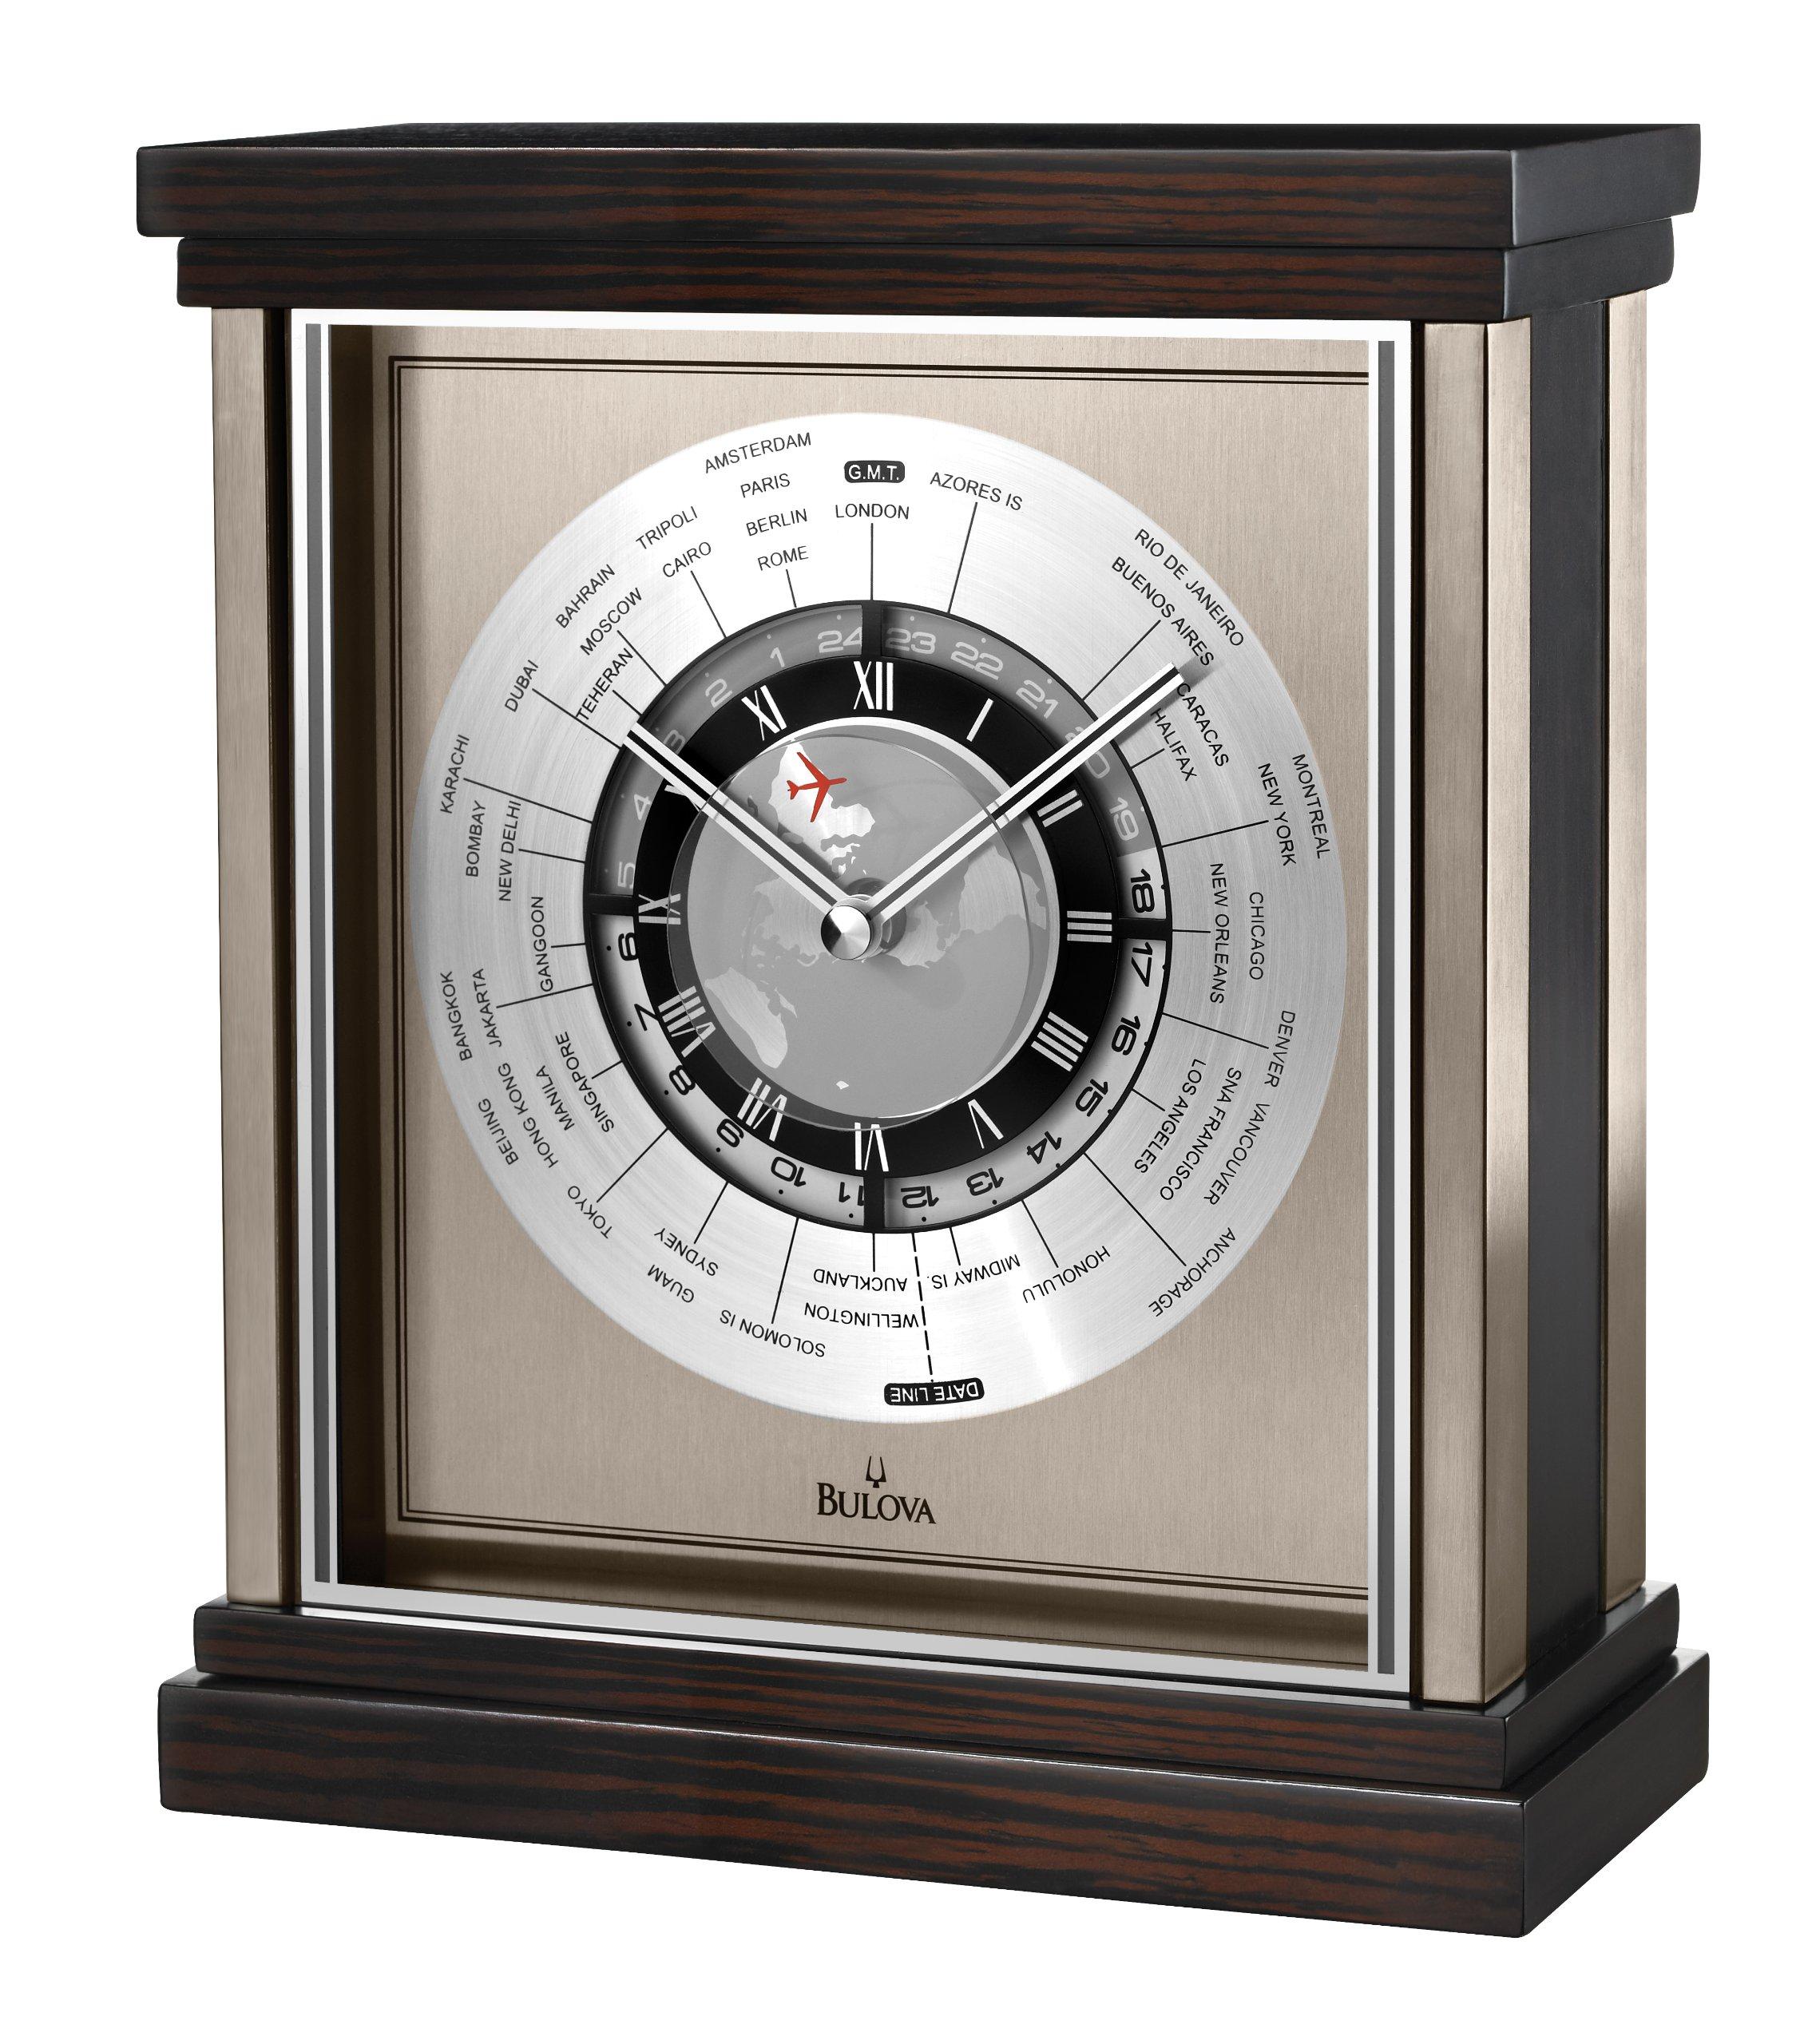 Bulova B2258 Wyndmere World Time Clock - Wood Case Clock Ebony Veneer Pattern With Mahogany Stain Brushed Stainless Steel Corners - clocks, bedroom-decor, bedroom - 91IIuFKx4AL -